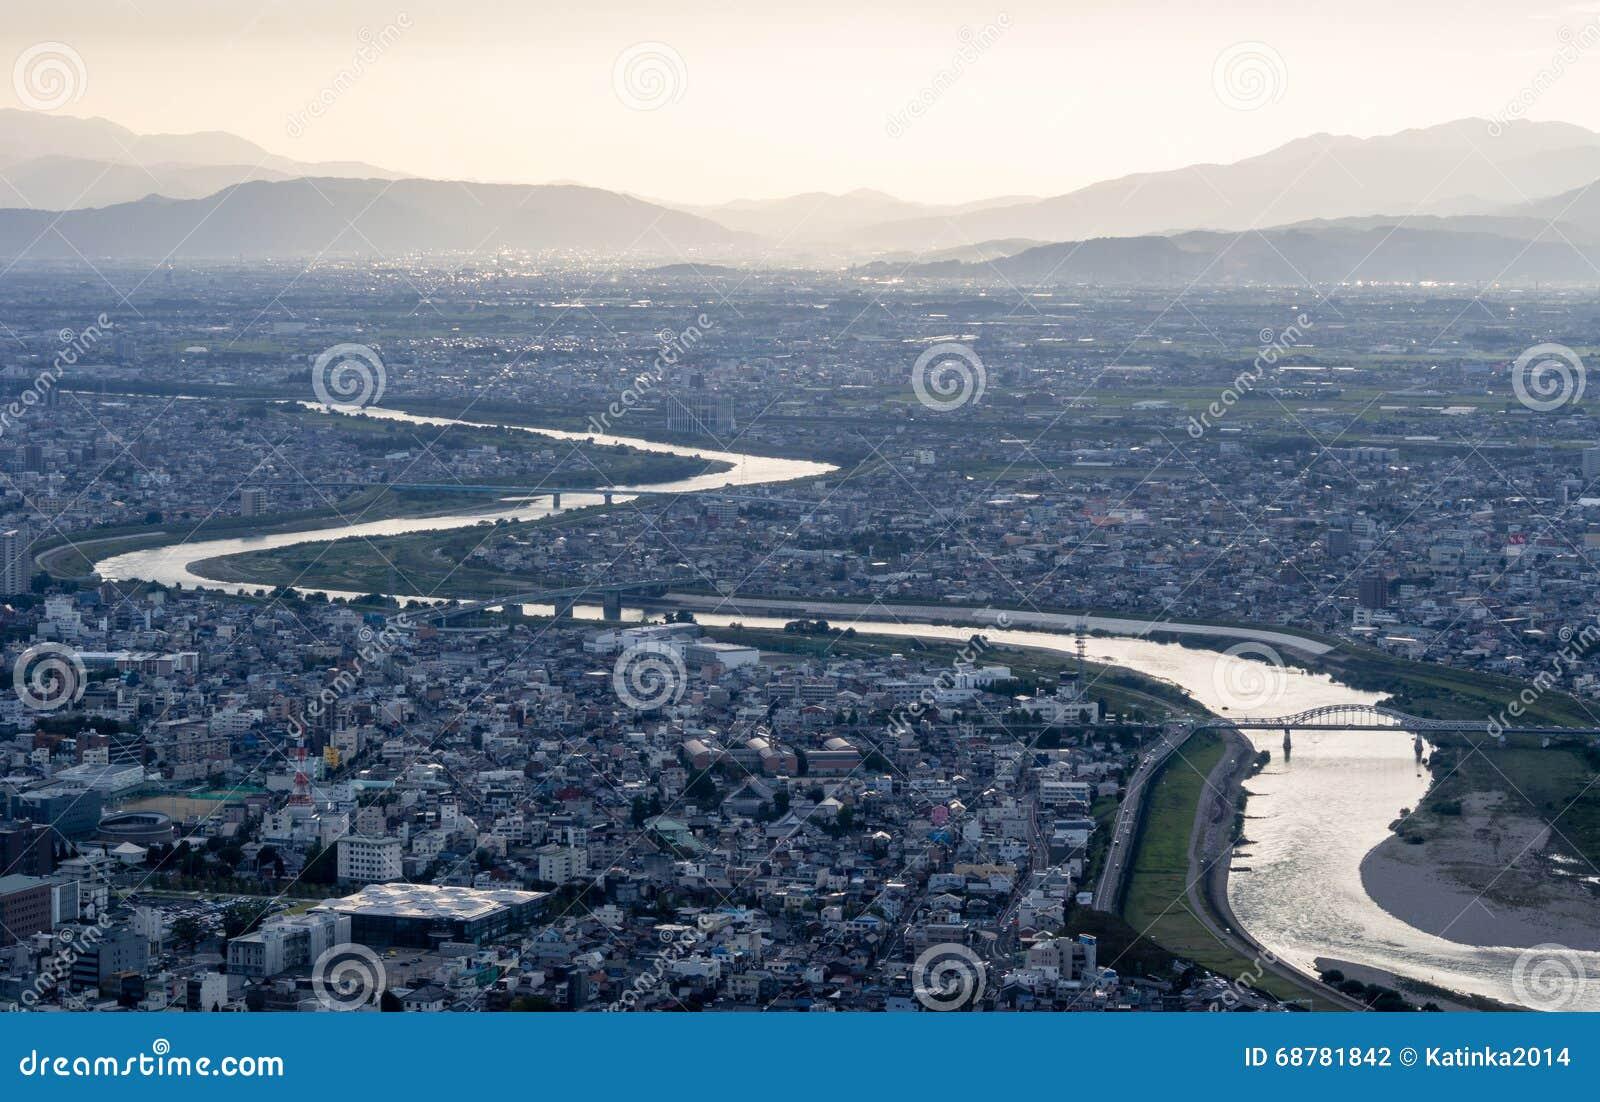 Panorama van de stad van Gifu, Japan